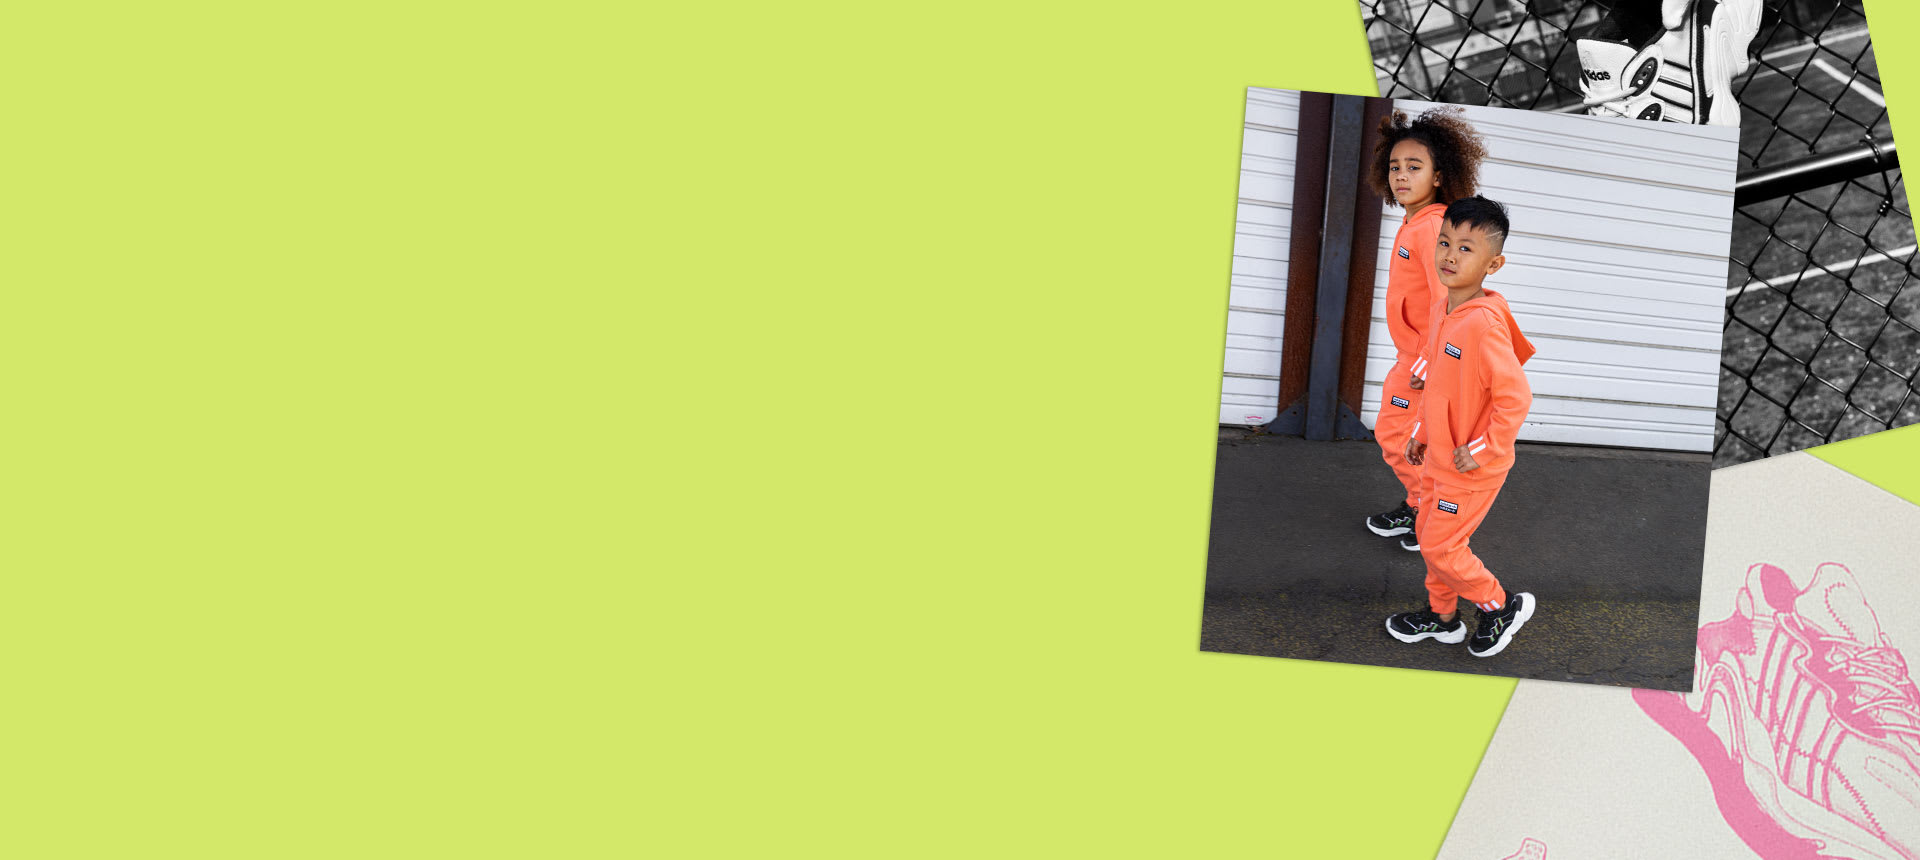 Officielle EnfantBoutique Adidas Officielle Adidas EnfantBoutique Adidas Officielle EnfantBoutique EnfantBoutique EnfantBoutique Officielle Adidas Adidas ZTPXukiO